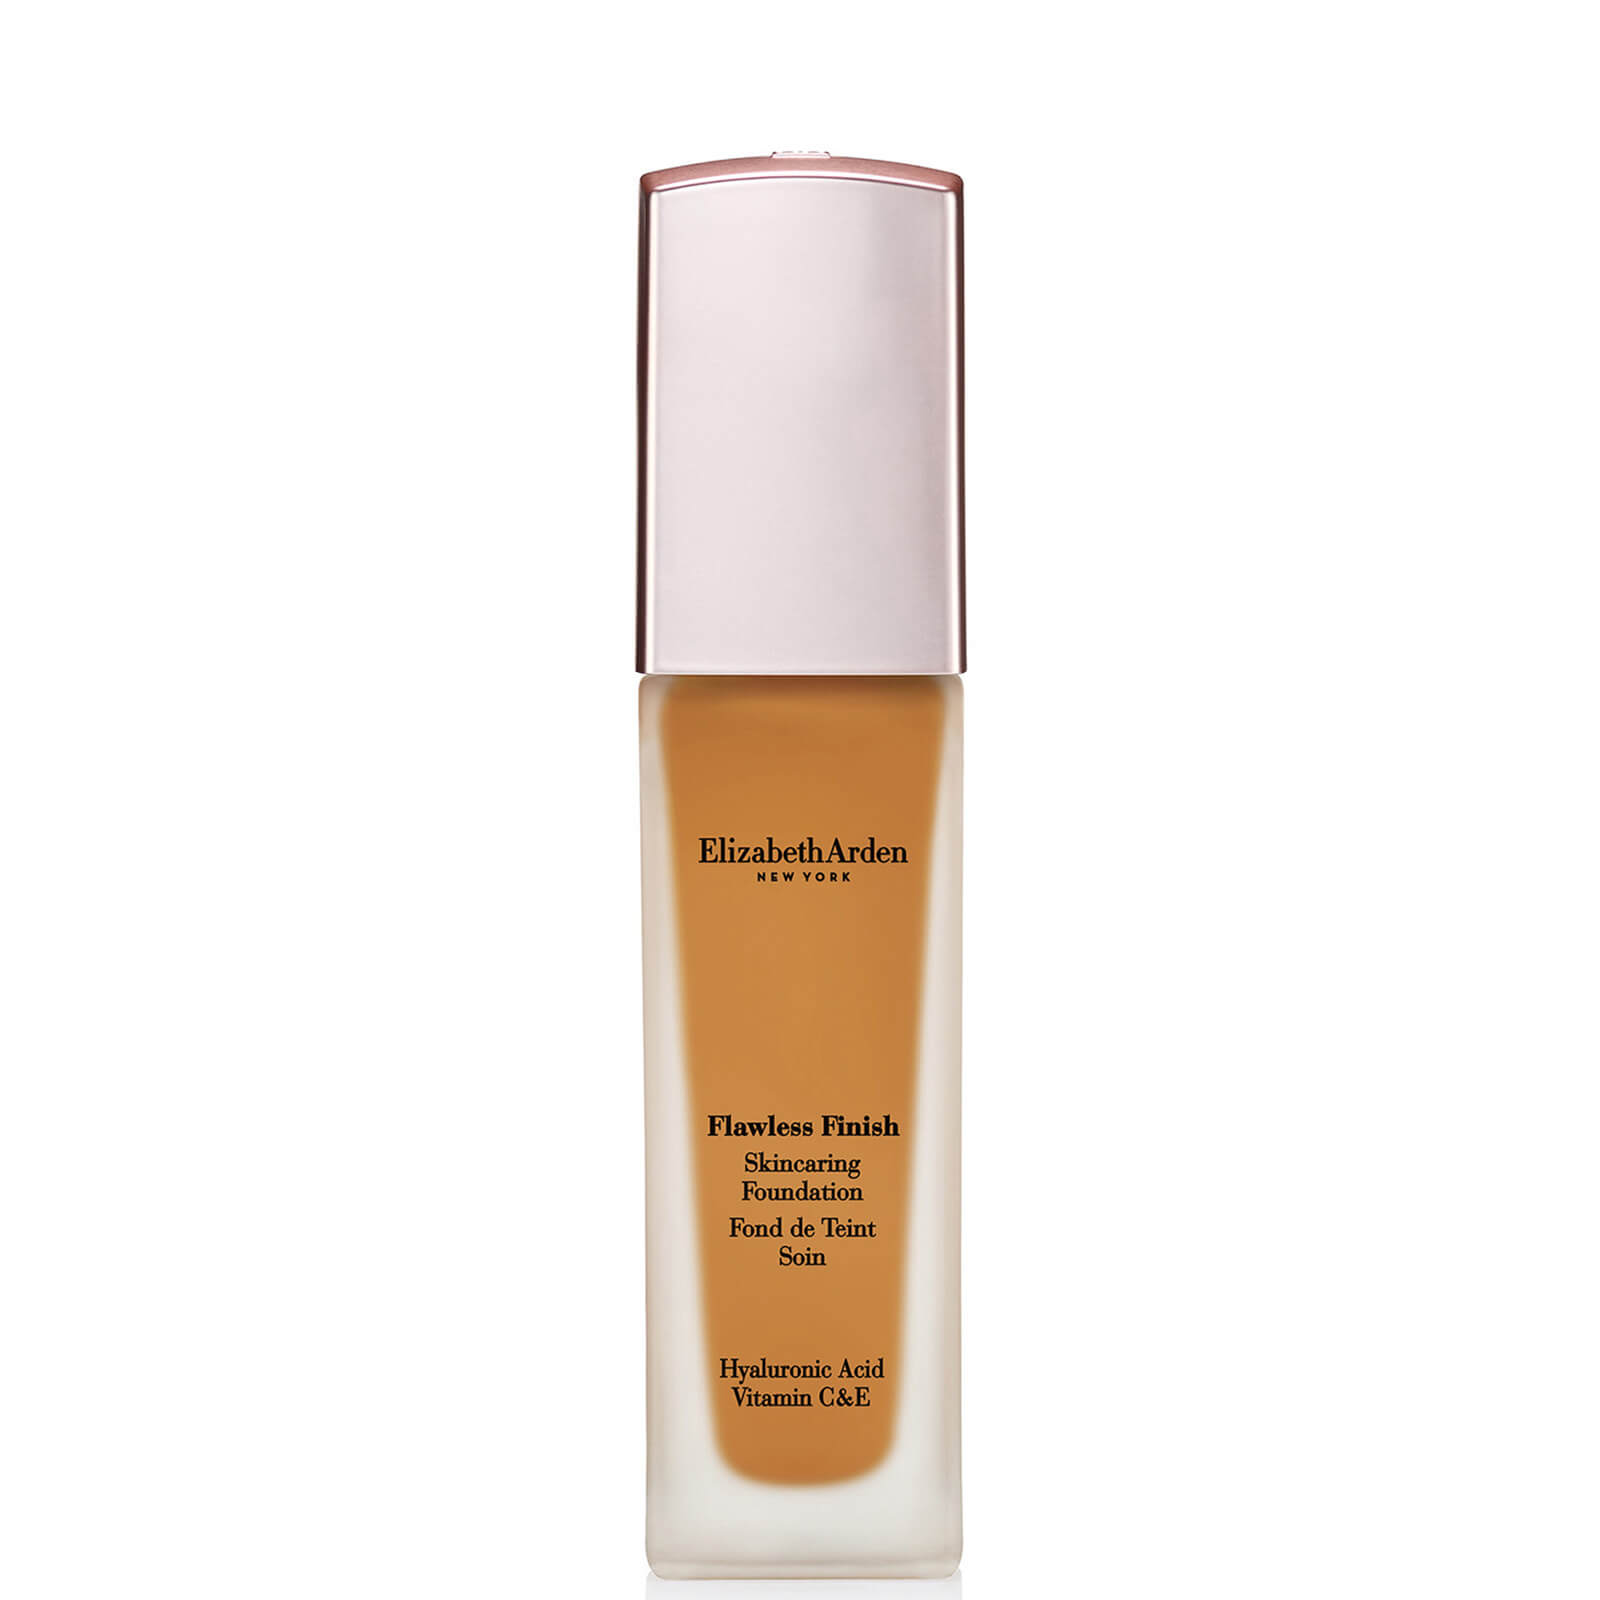 Купить Elizabeth Arden Flawless Finish Skincaring Foundation 30ml (Various Shades) - 510N